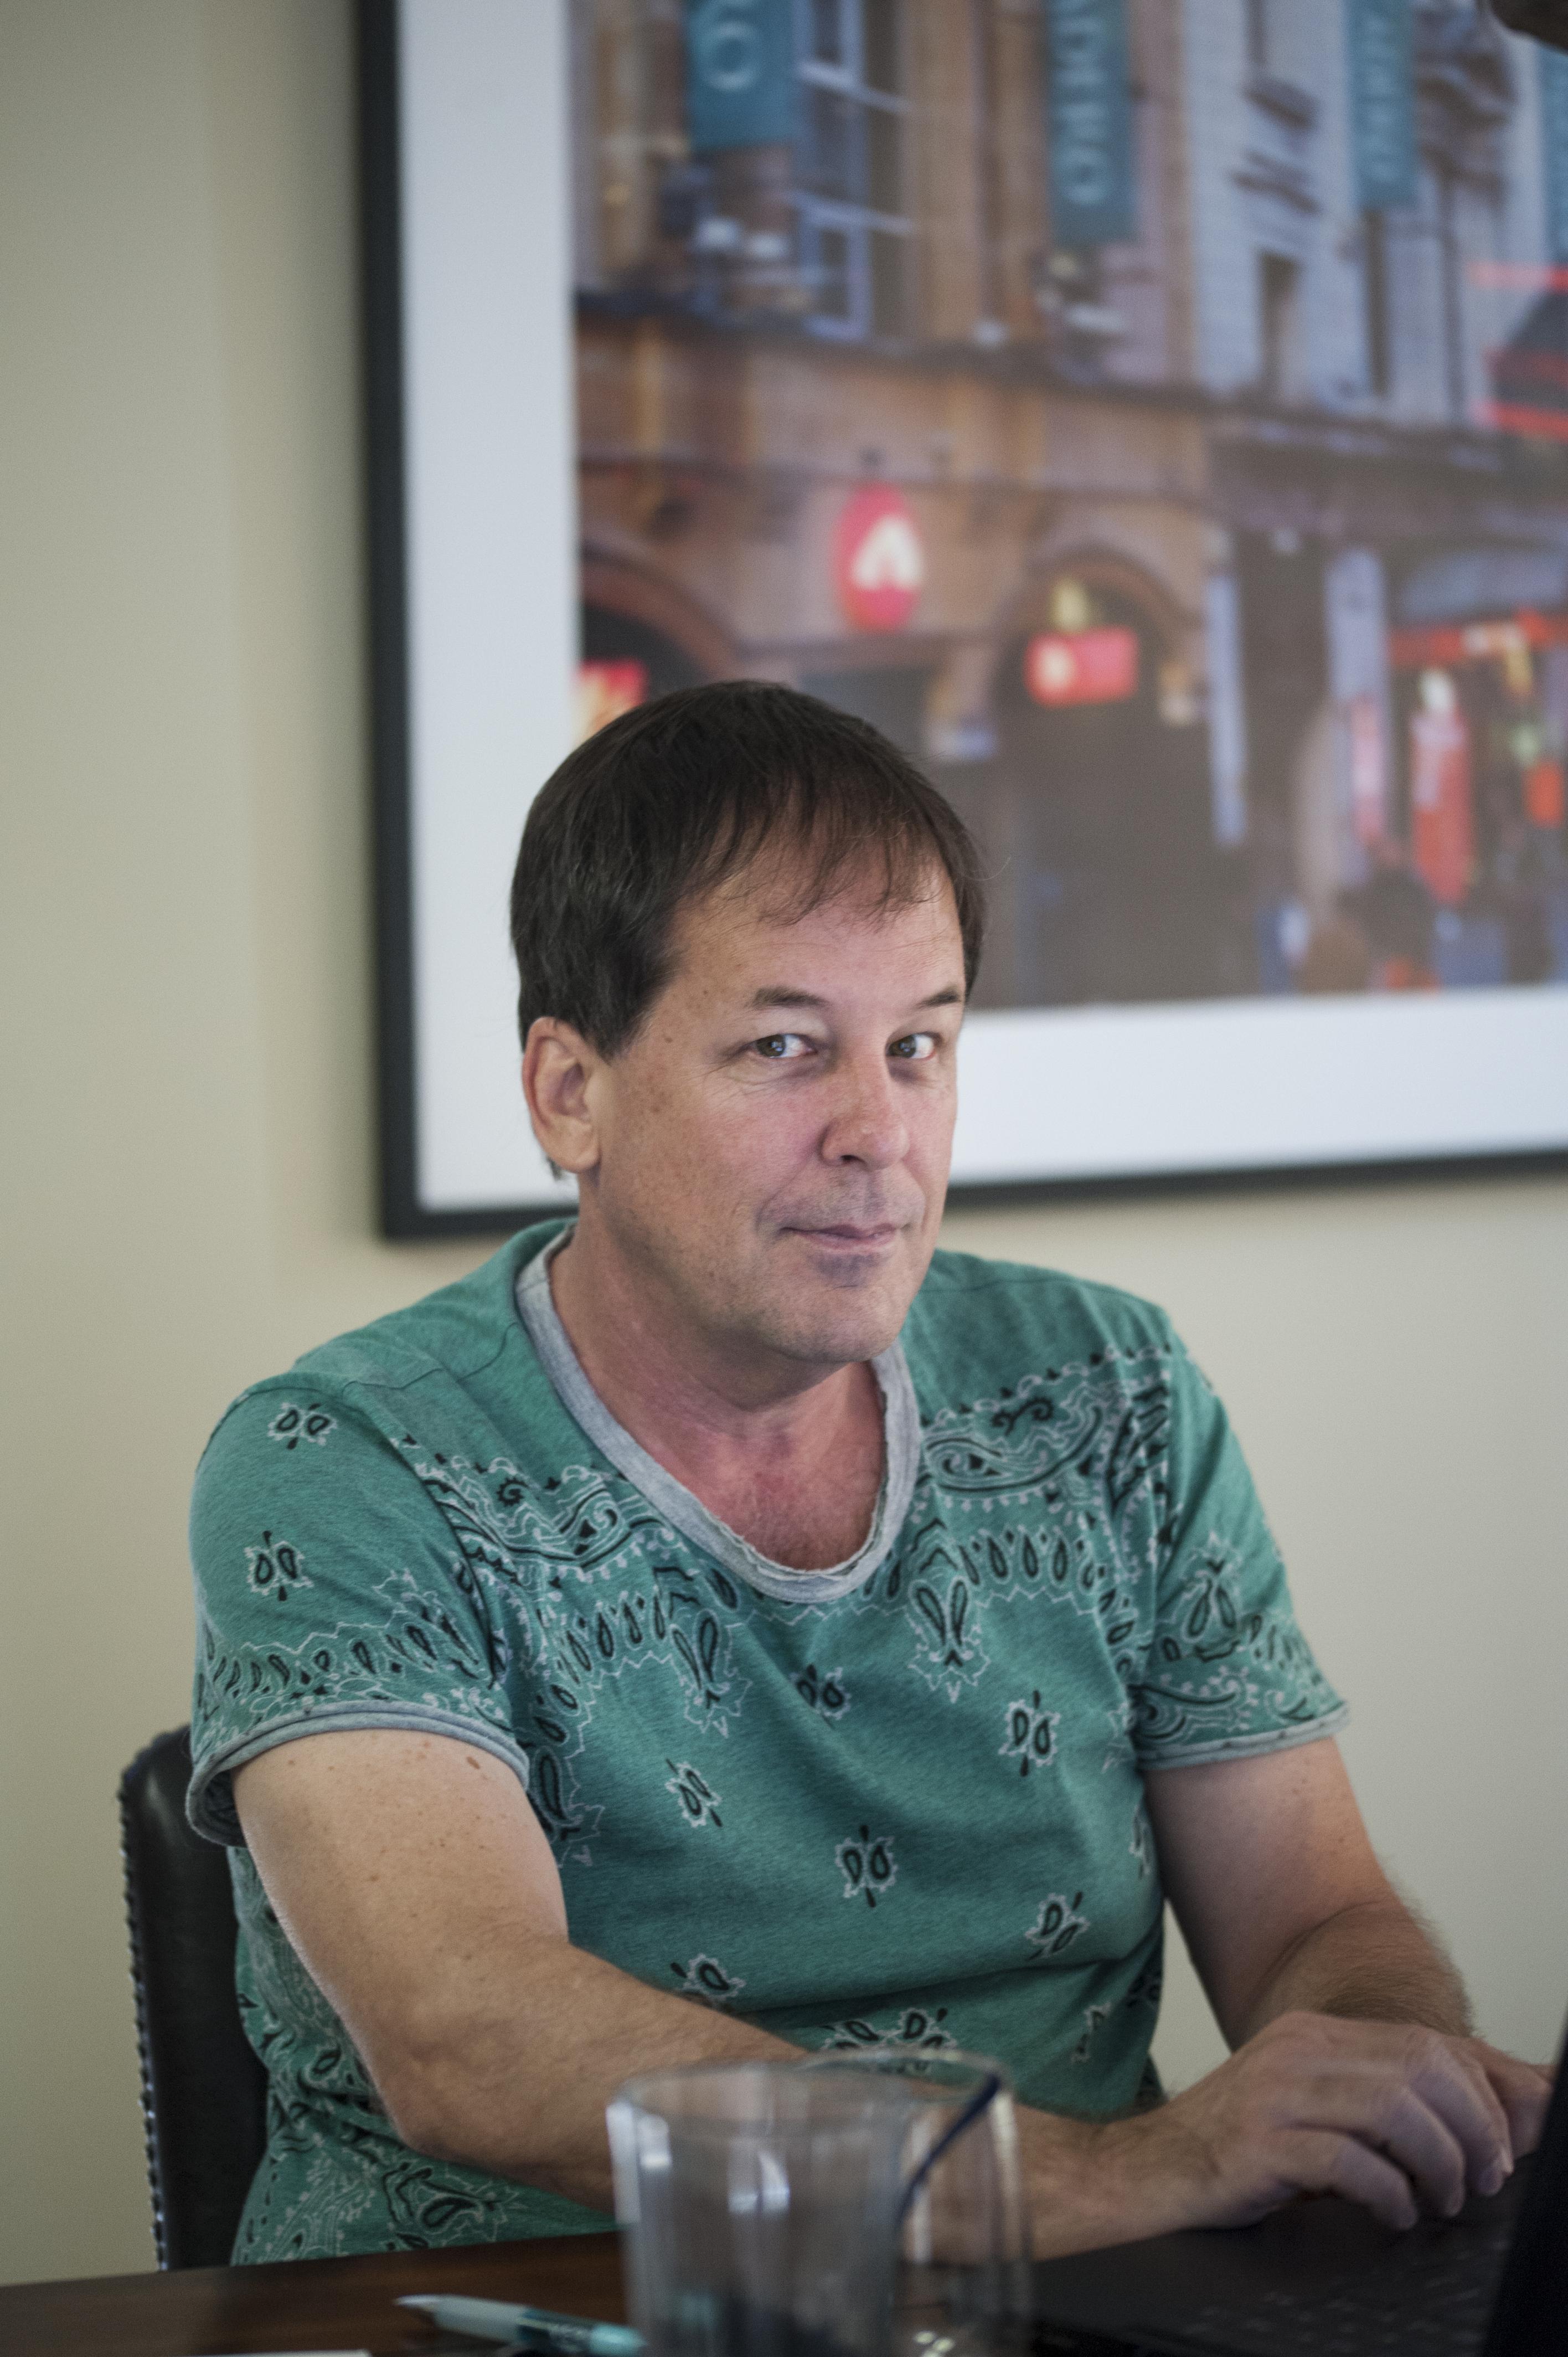 Ken Eade at Desk